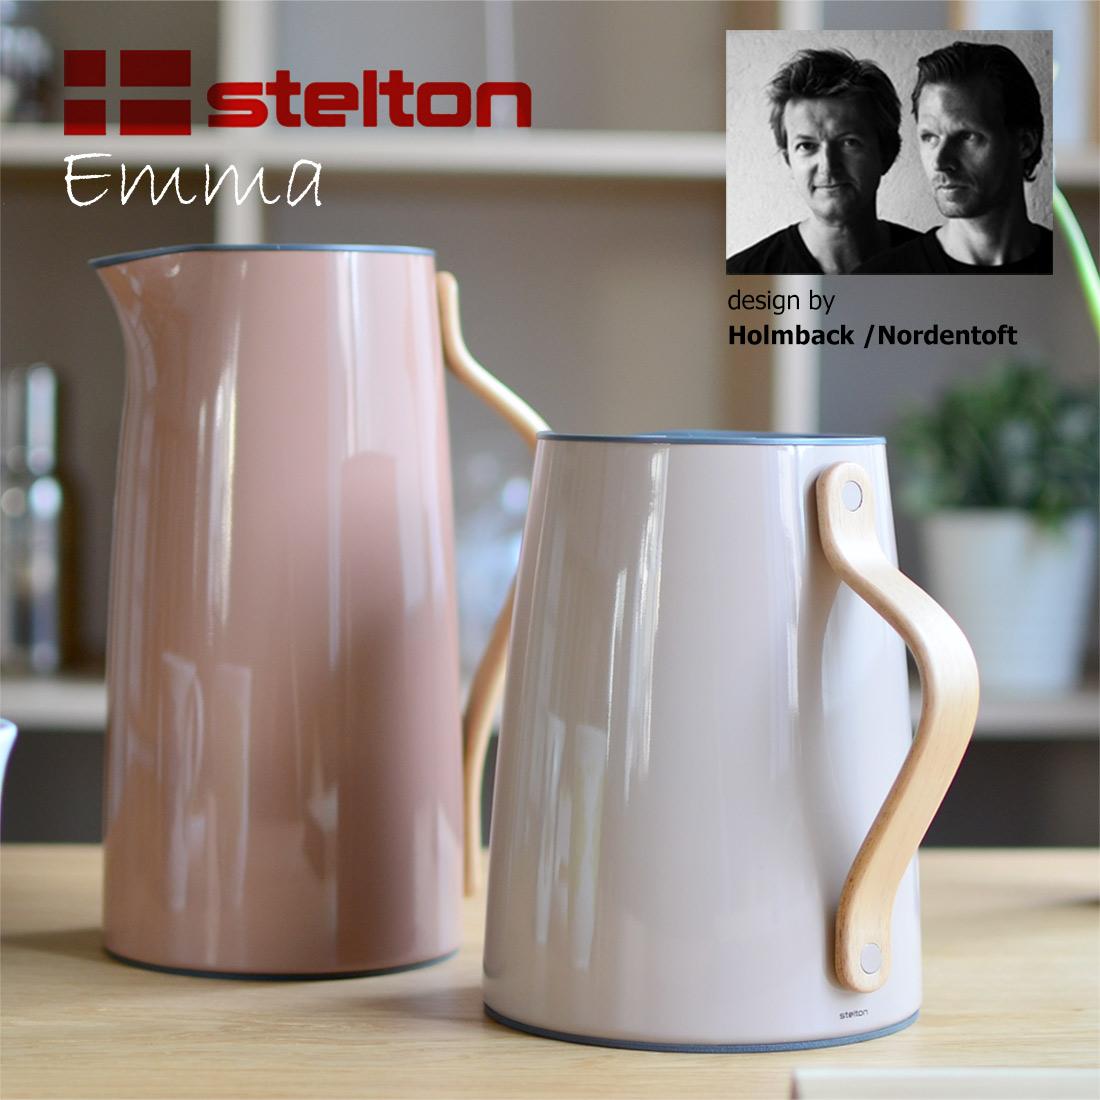 【Stelton/ステルトン】Emma/エマ バキュームジャグ Tea 1L & Coffee 1.2L NUDE TERRACOTTAエンマ 魔法瓶 水筒 ジャグ 北欧【コンビニ受取対応商品】